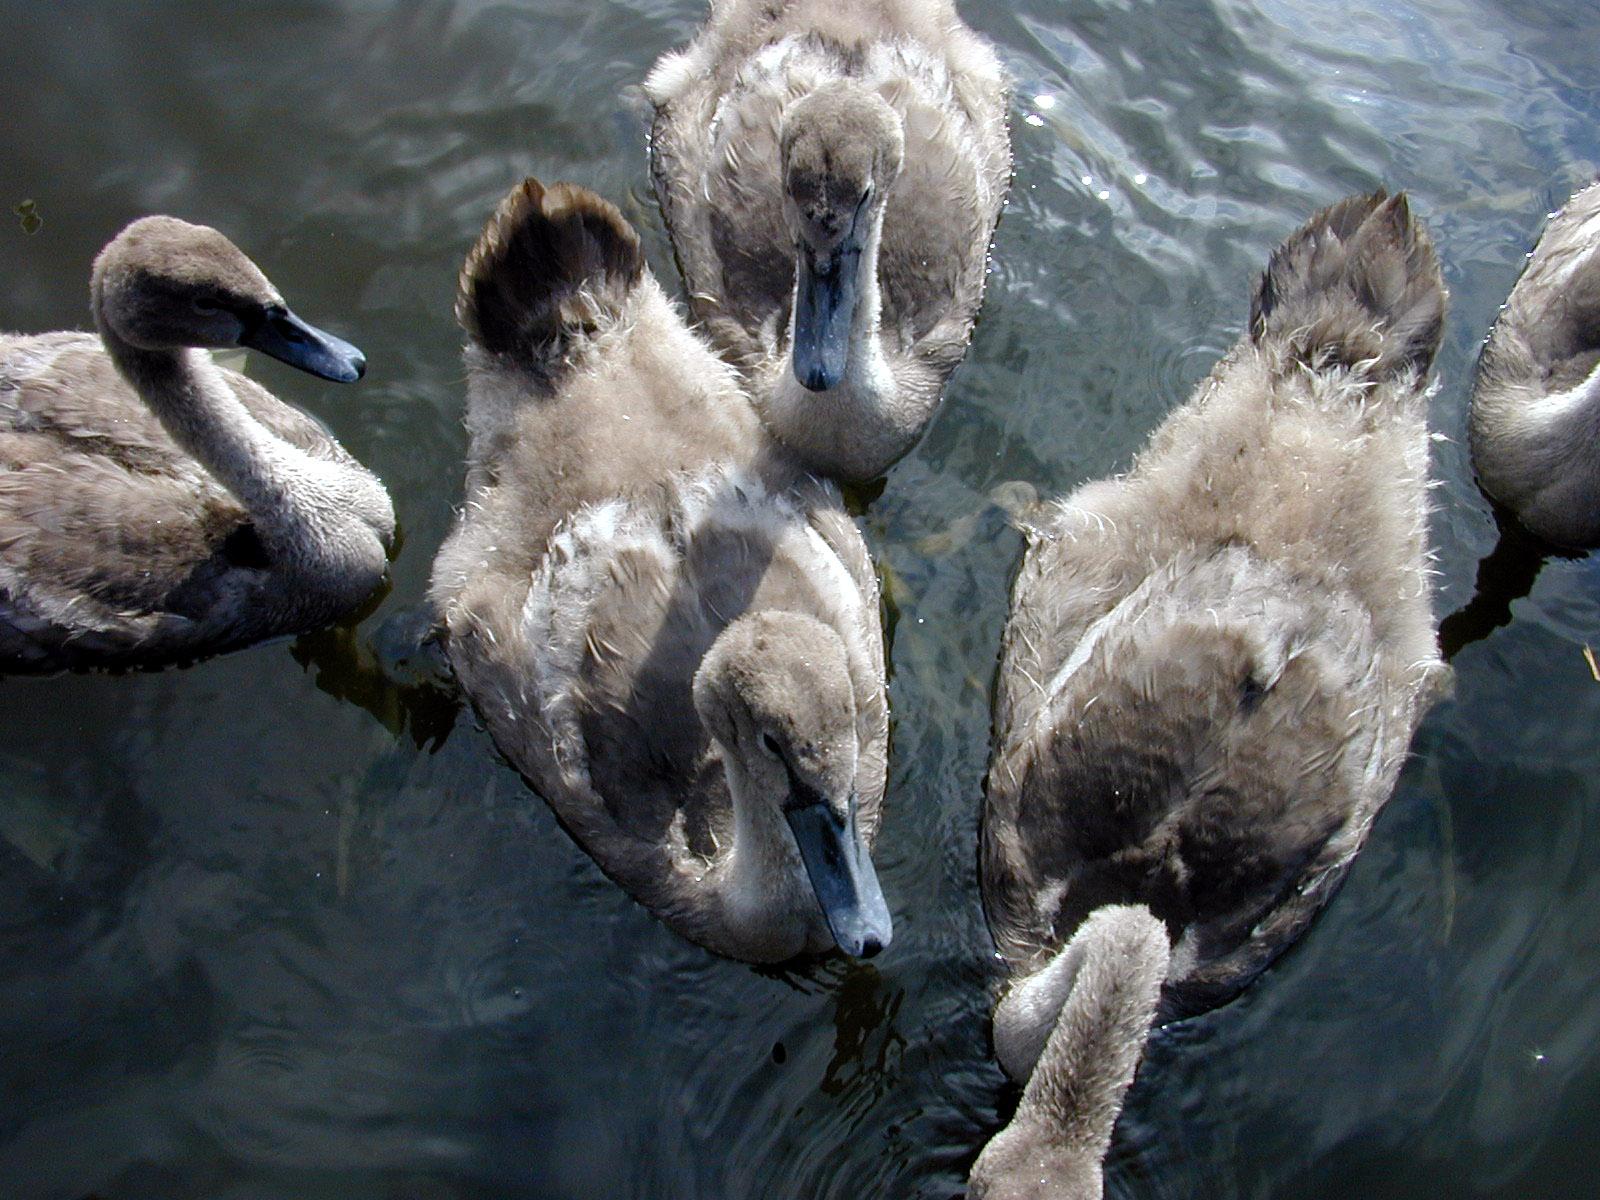 duck ducks ducklets young quack chicks beak beaks feeding the time fluffy